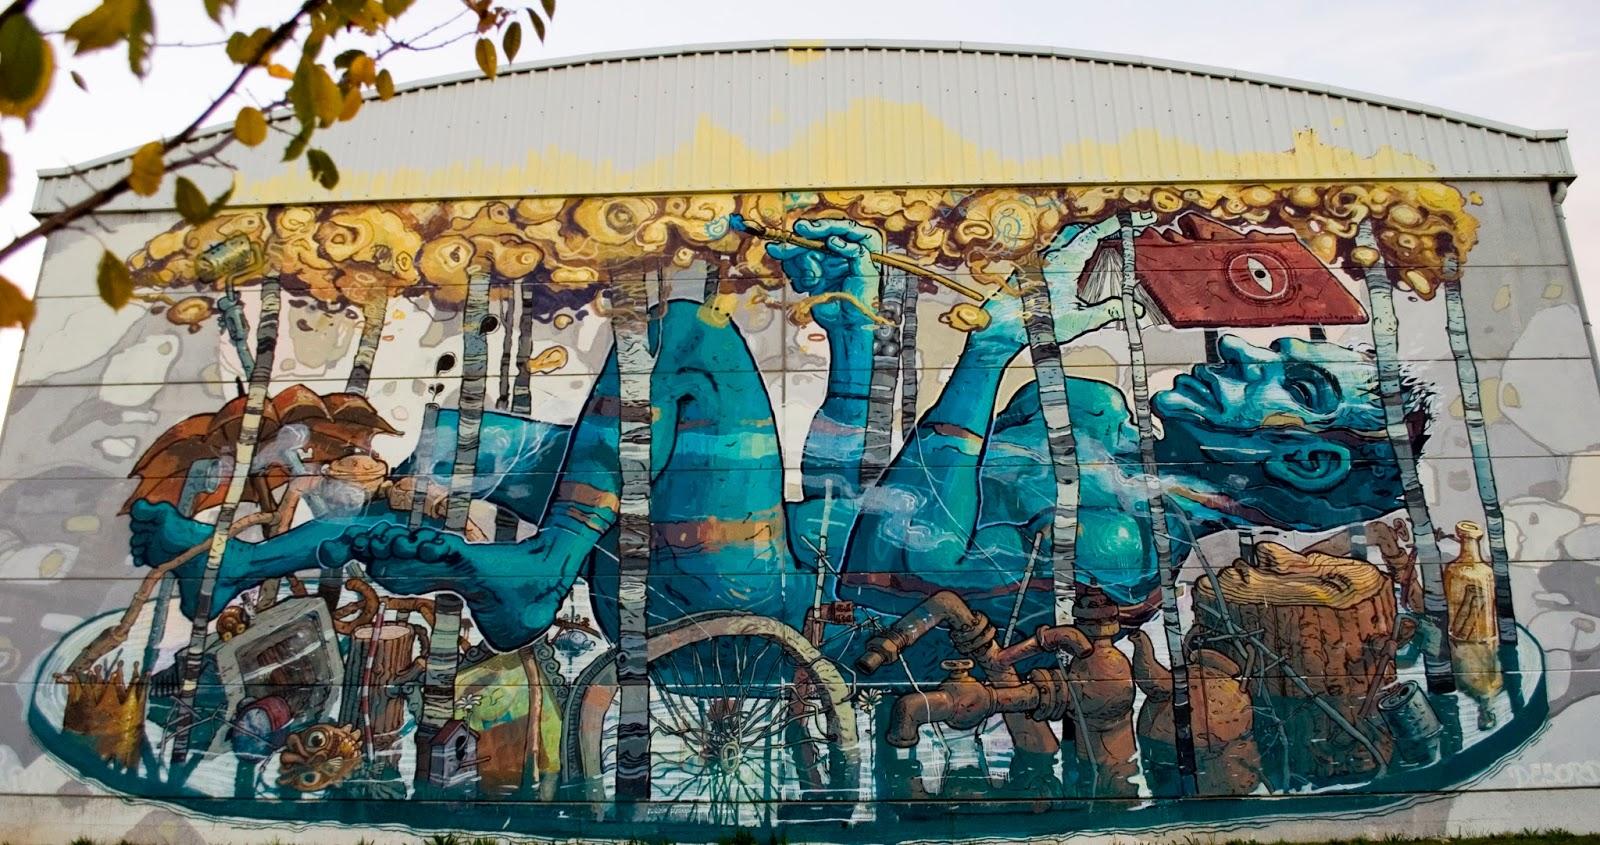 Riquiño-new-mural-at-desordes-creativas-2013-03